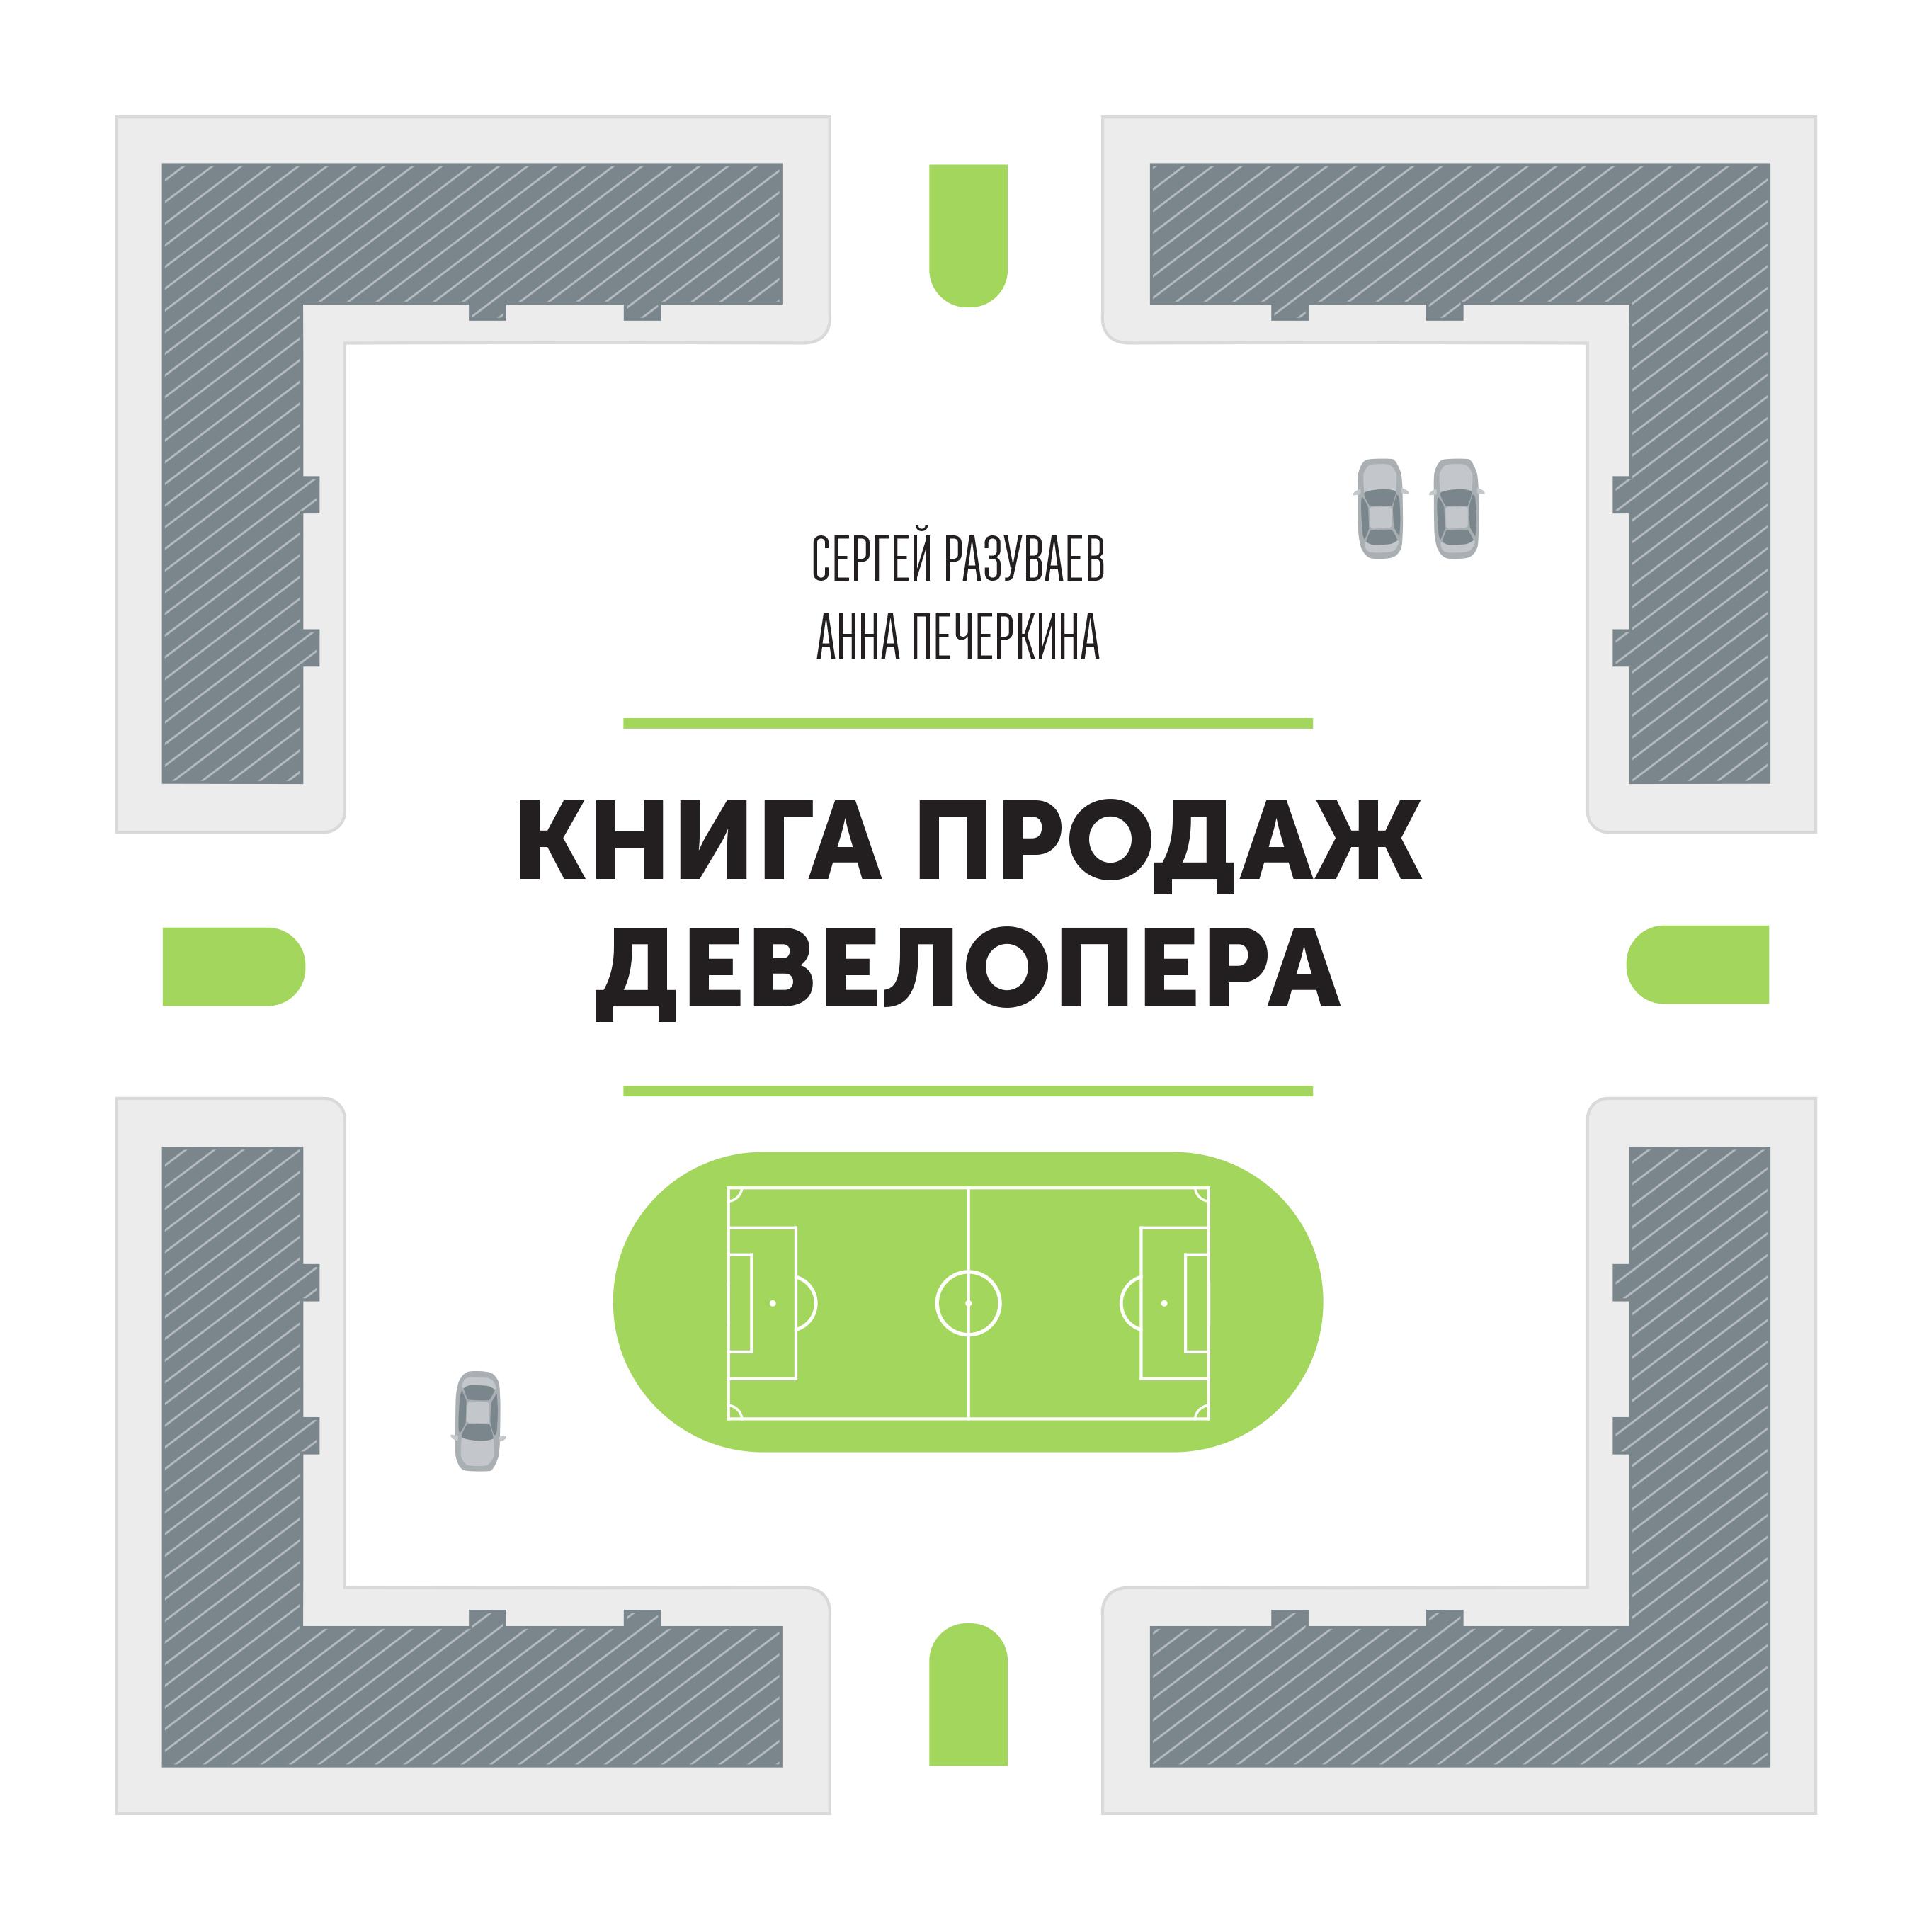 Книга продаж девелопера ( Разуваев С.; Печеркина А.  )